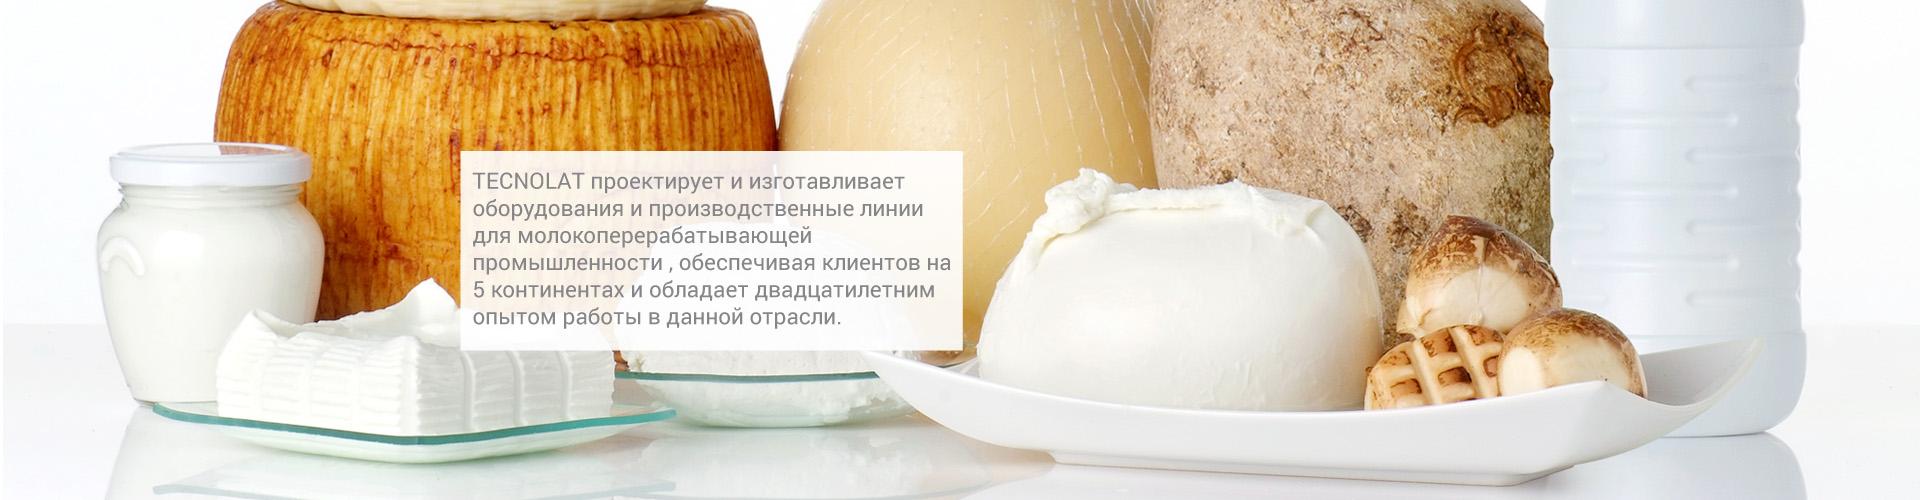 macchine_lattiero_ru